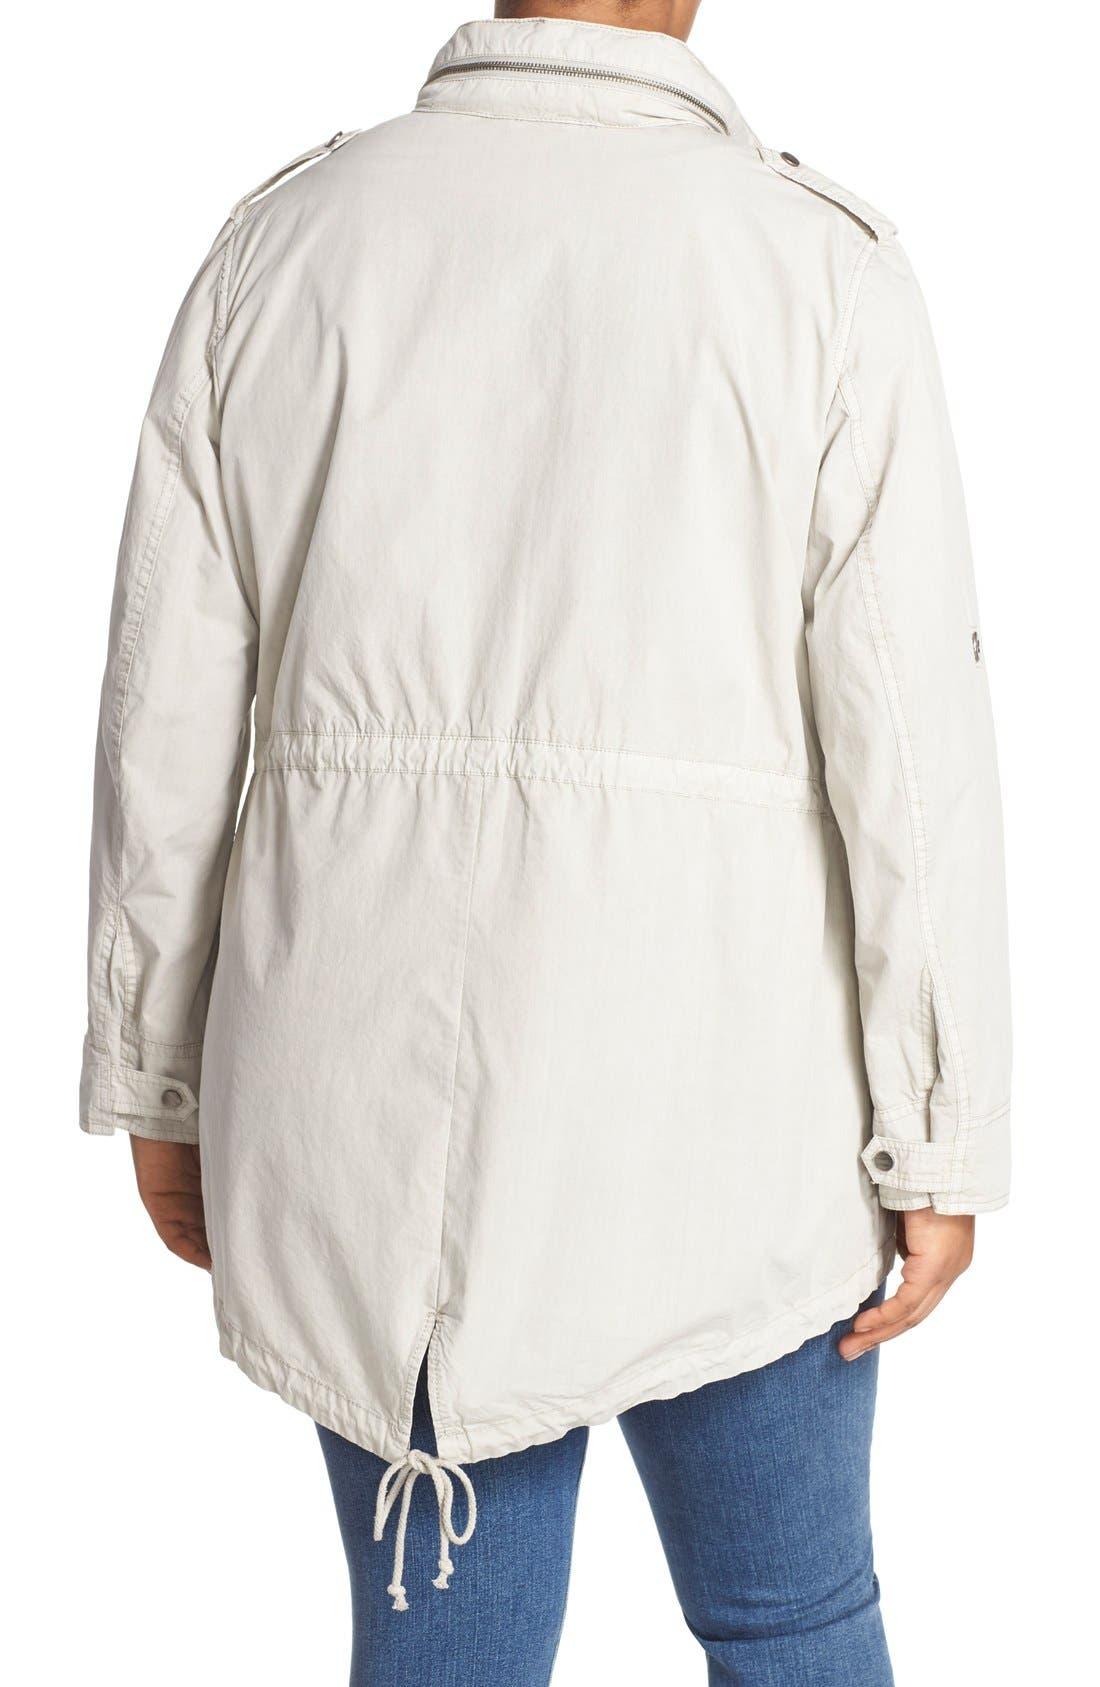 Parachute Hooded Cotton Utility Jacket,                             Alternate thumbnail 8, color,